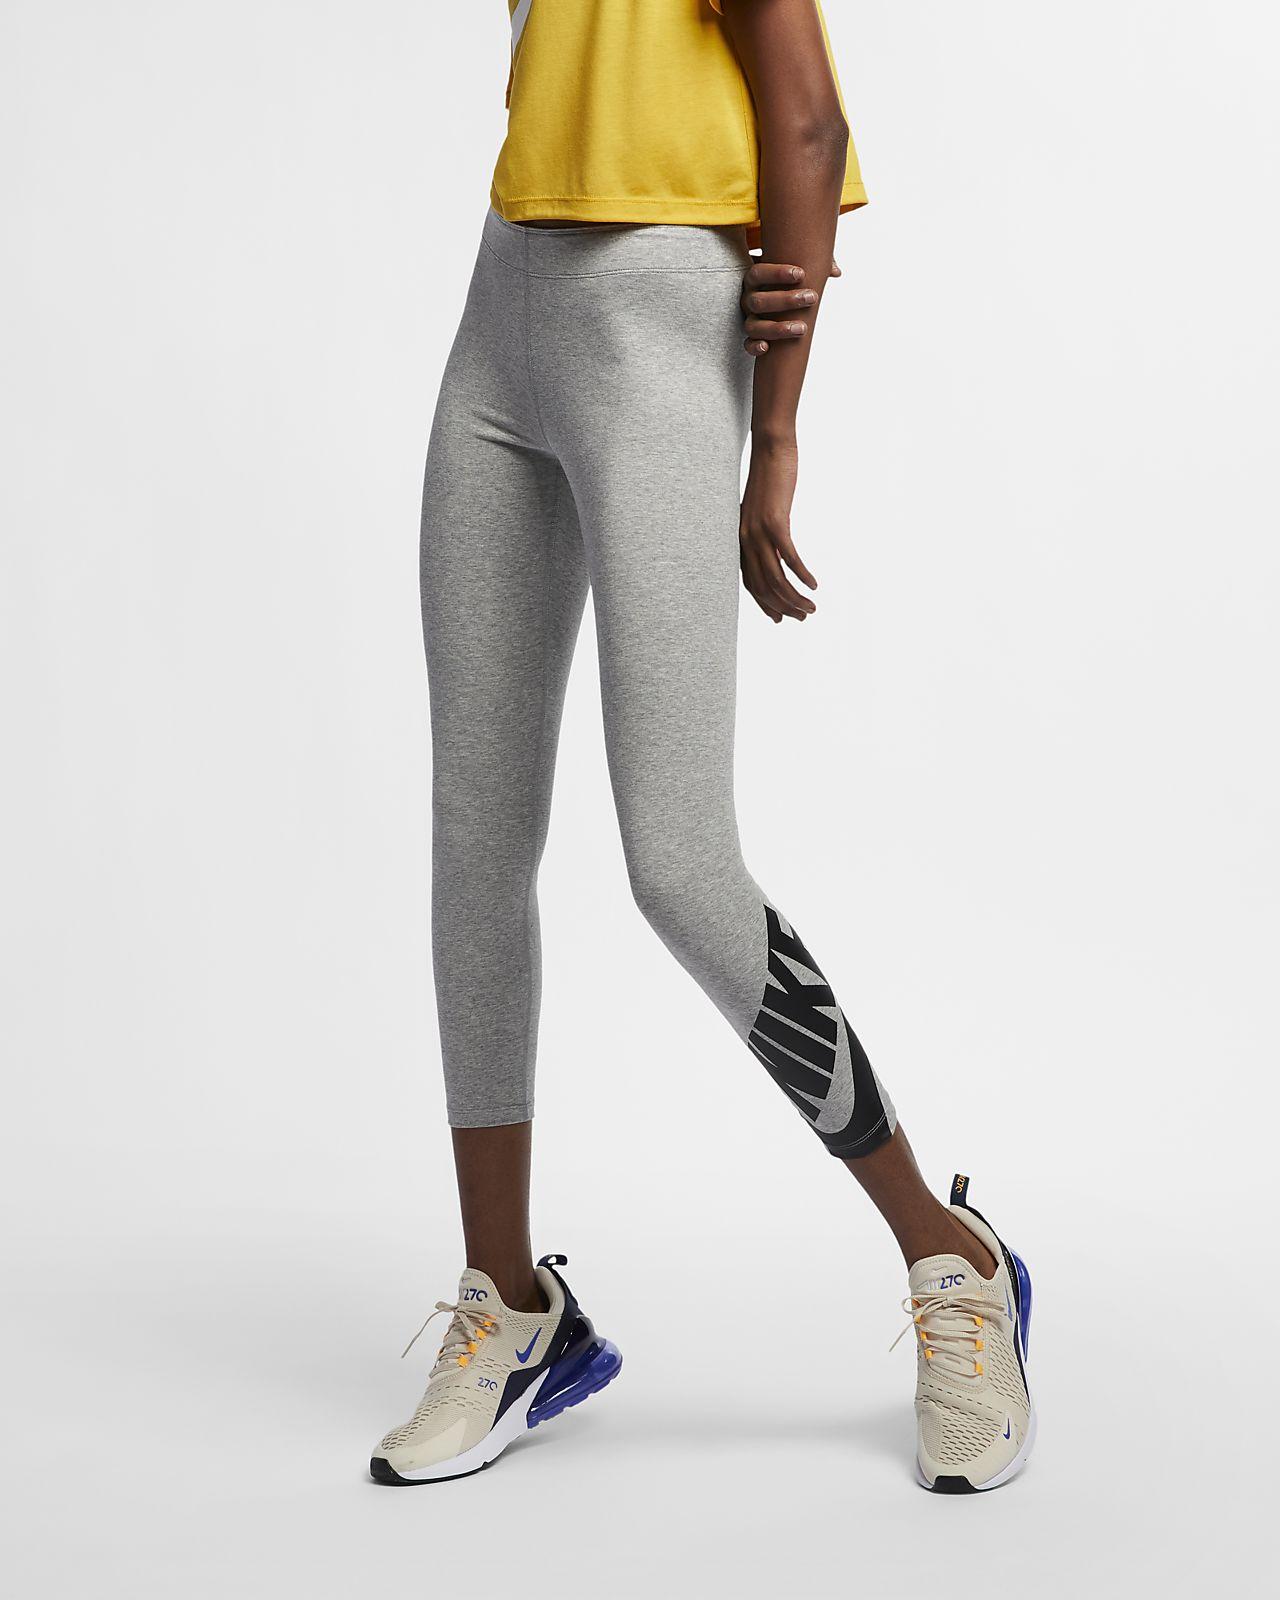 537f474616 Nike Sportswear Leg-A-See Women's 7/8 Leggings. Nike.com GB